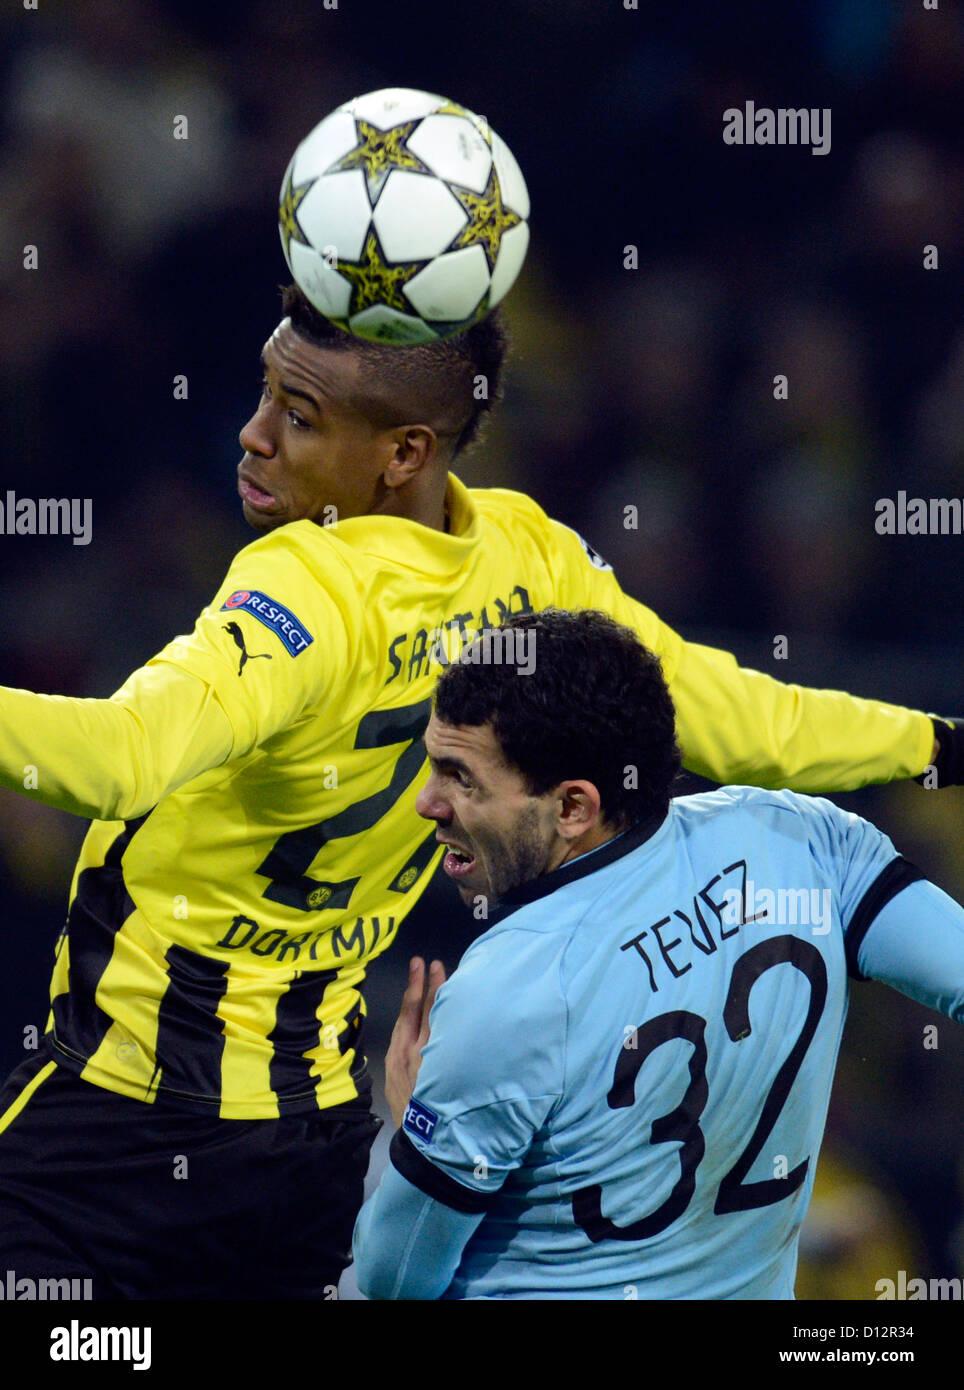 Carlos Dortmund dortmund s felipe santana l and carlos tevez of manchester vie for